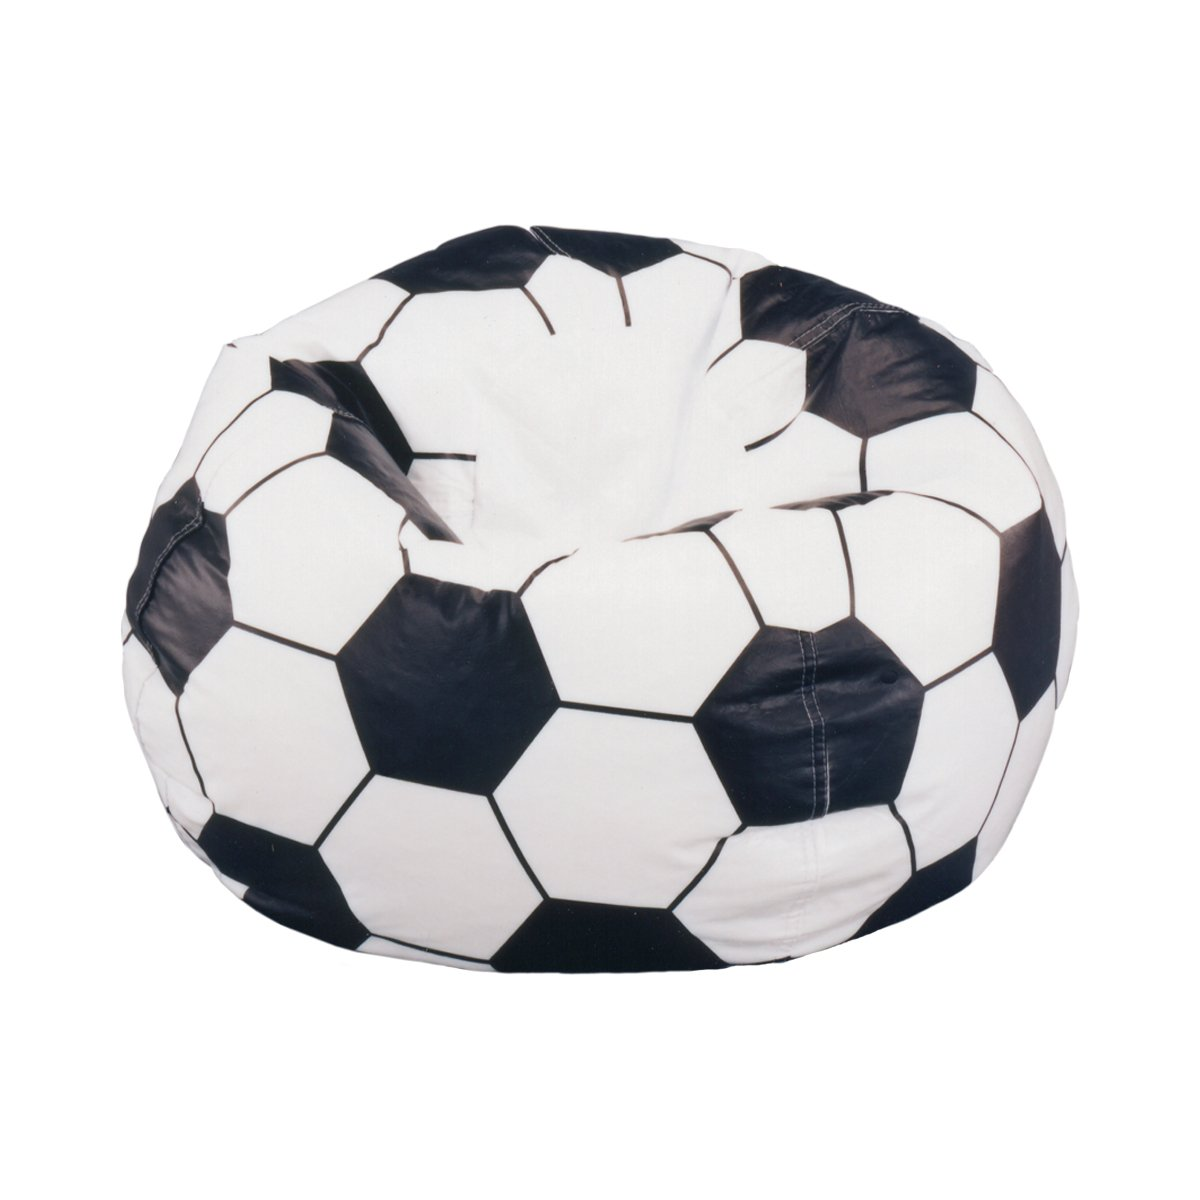 Charmant Amazon.com: American Furniture Alliance Kidu0027s Sports Soccerball: Kitchen U0026  Dining